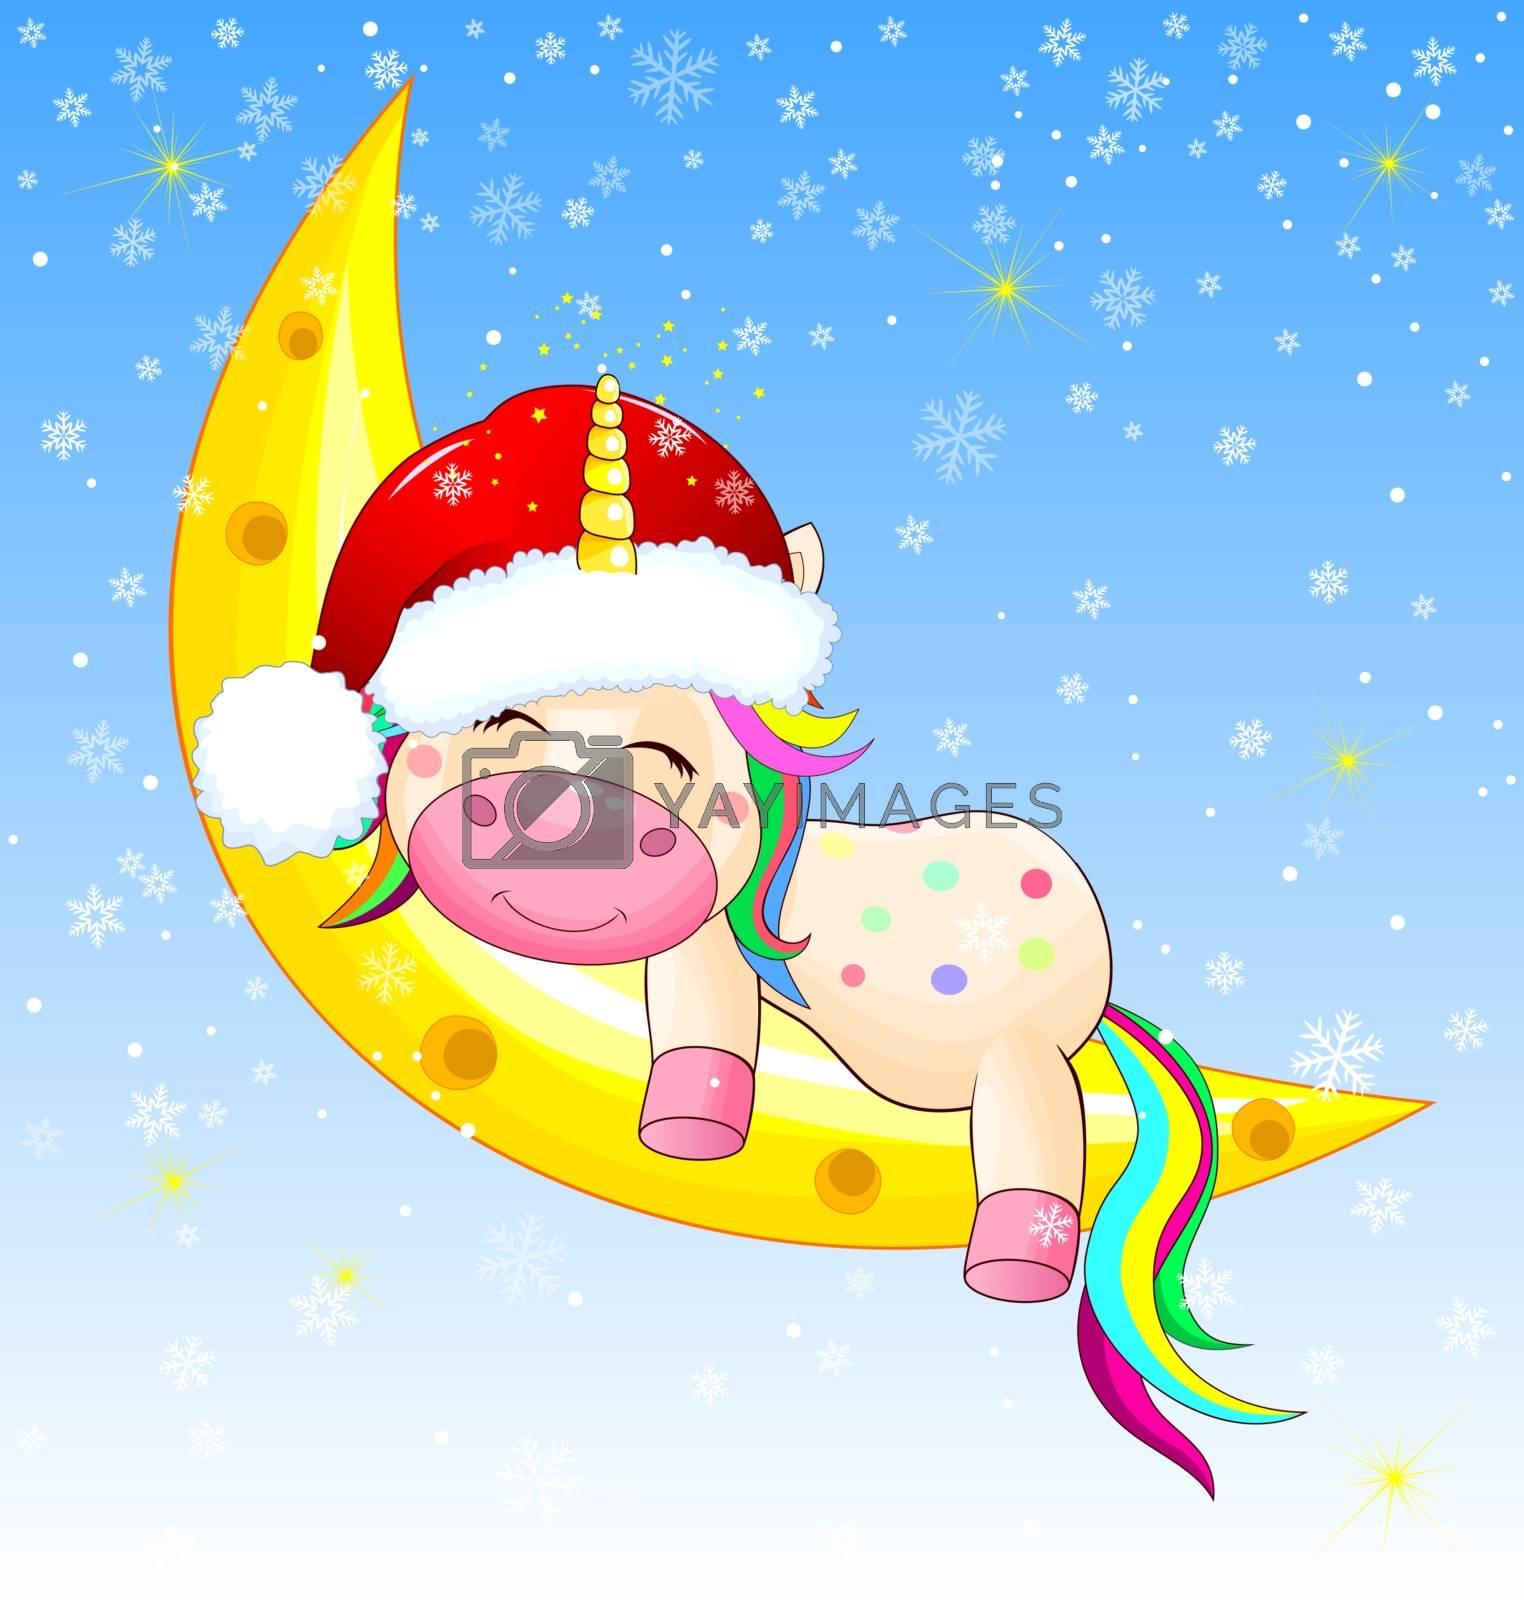 Little unicorn sleeping on the moon on Christmas night. Sky, snowflakes, glowing stars.